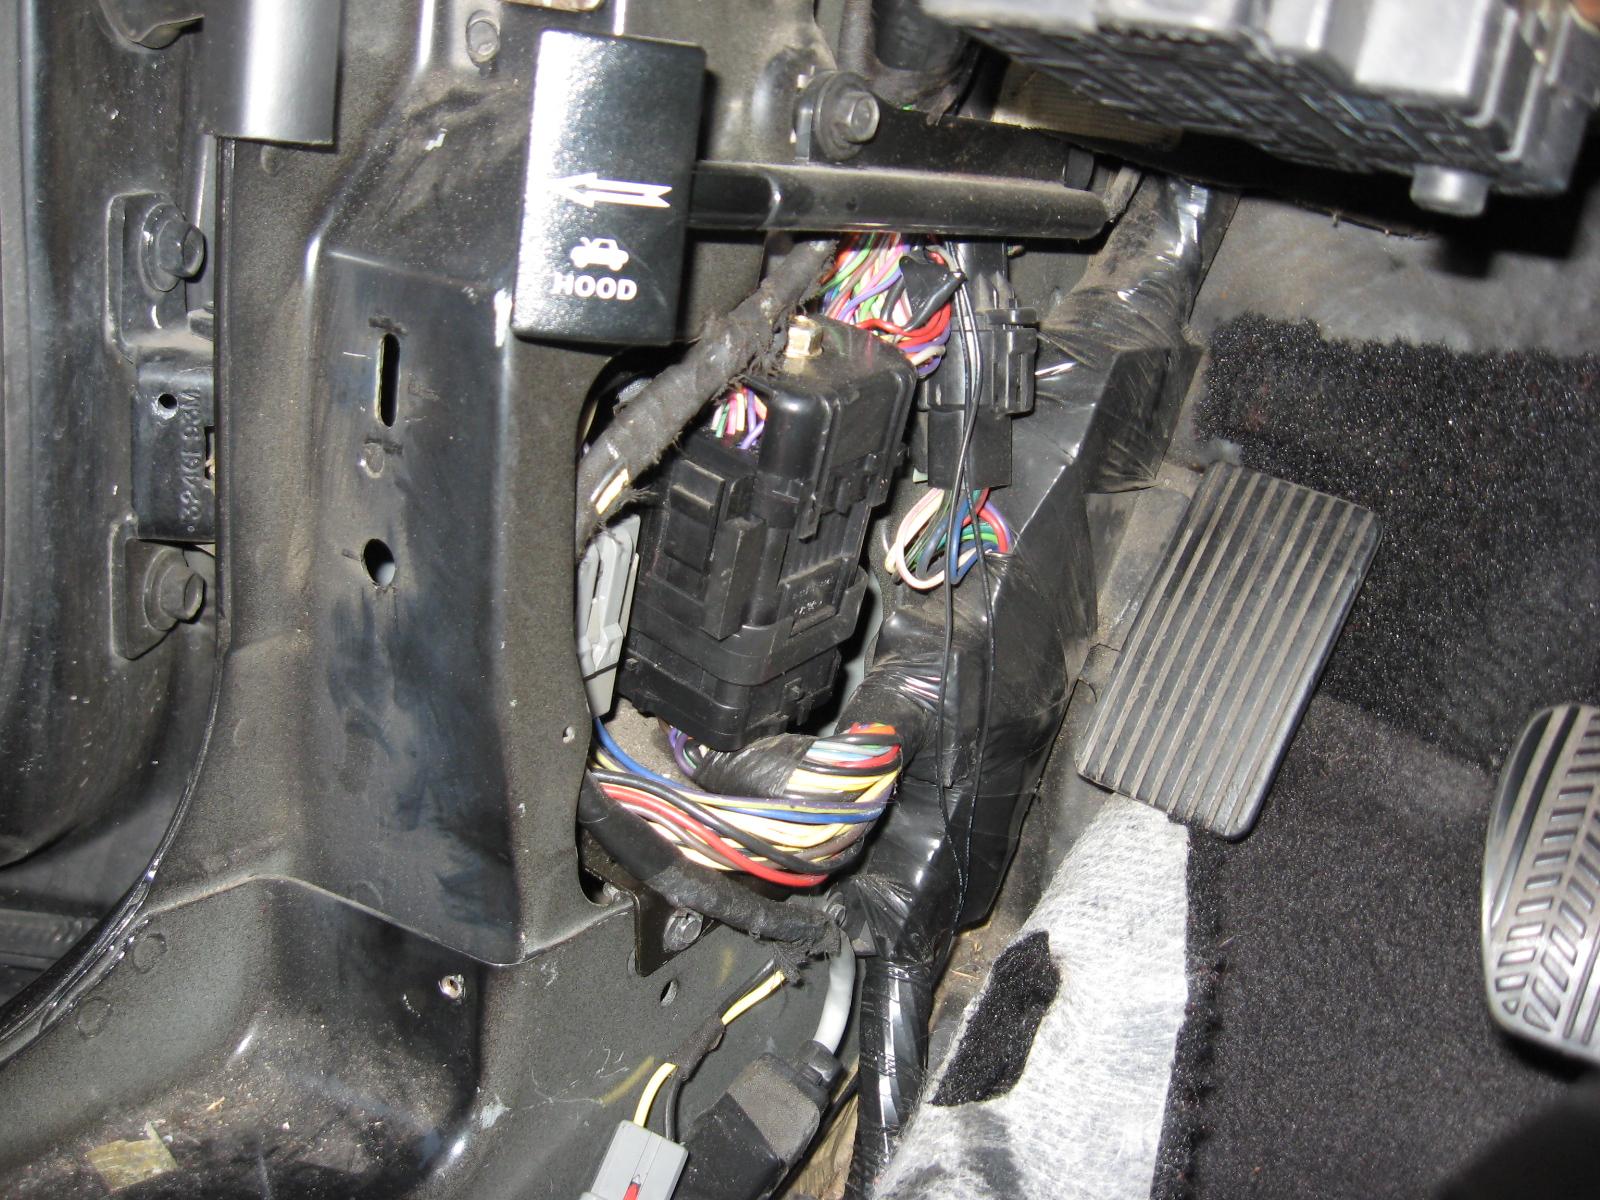 95 mustang gt alternator wiring diagram iso process audit turtle 1994 1995 export taillight installation